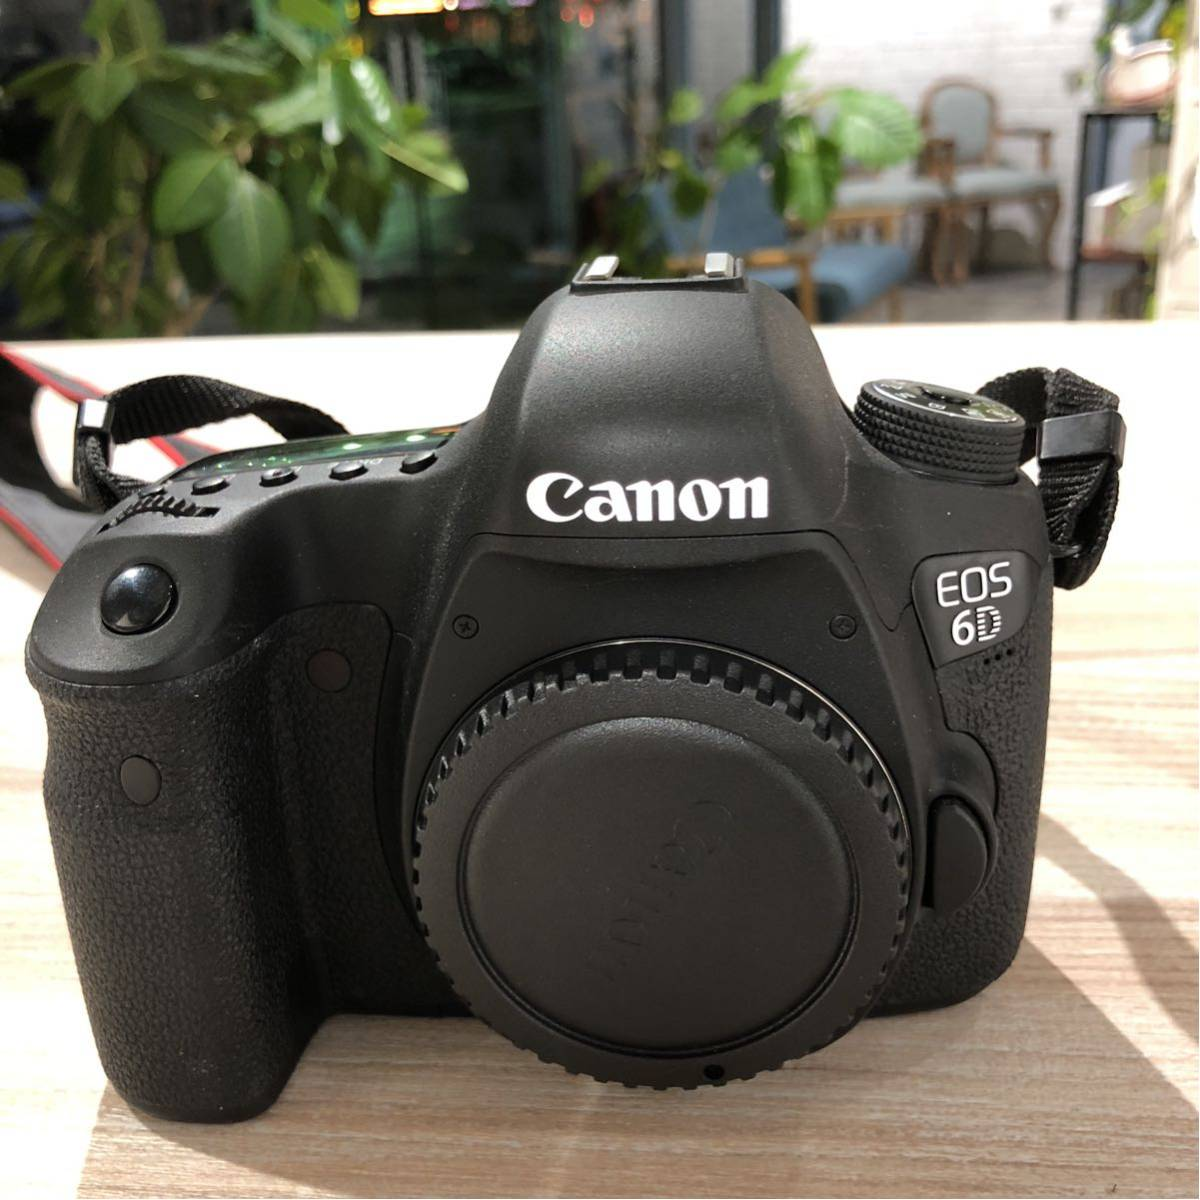 Canon キャノン 一眼レフ フルサイズ 6D ボディ 付属品完備_画像6